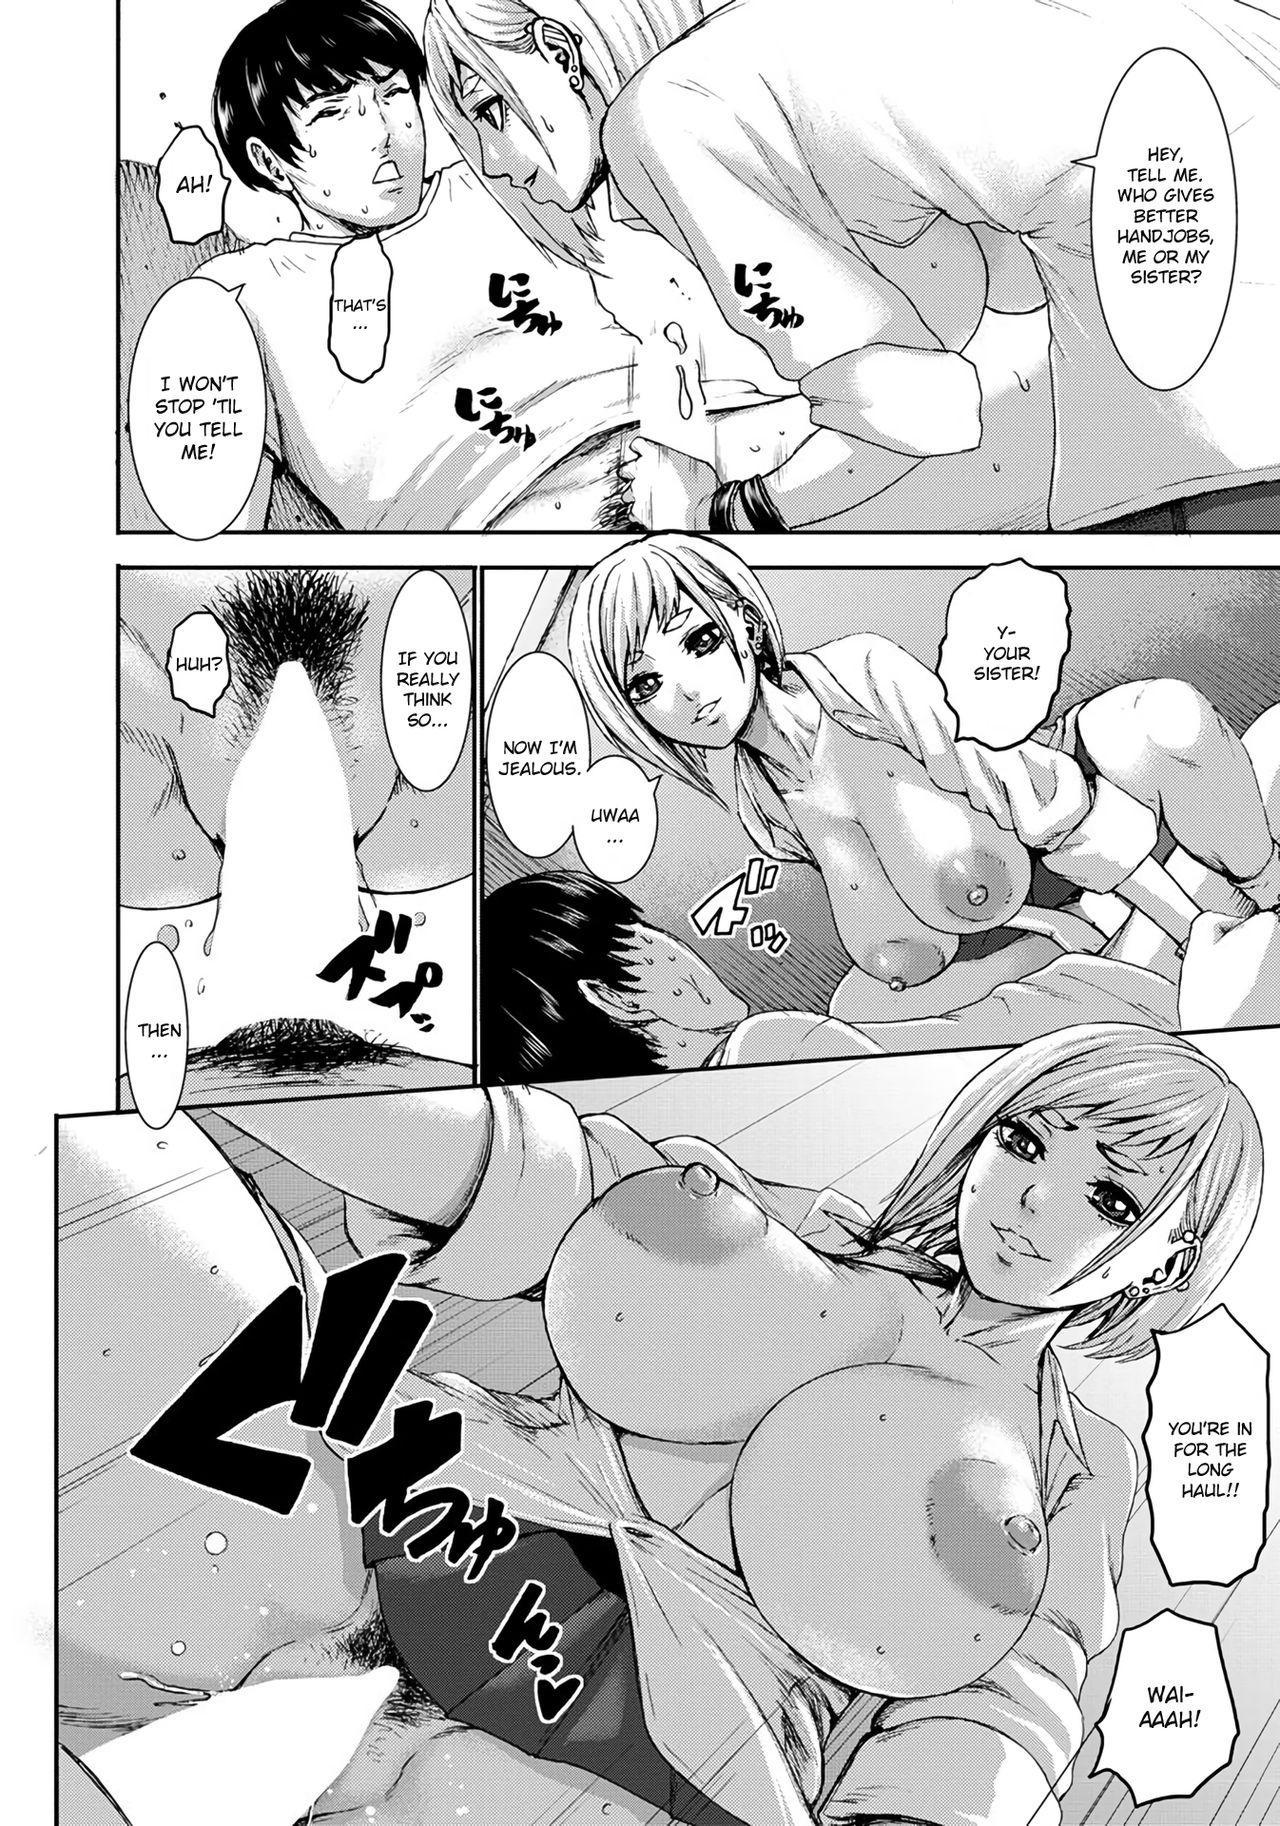 Chounyuu Gakuen | Academy For Huge Breasts 123